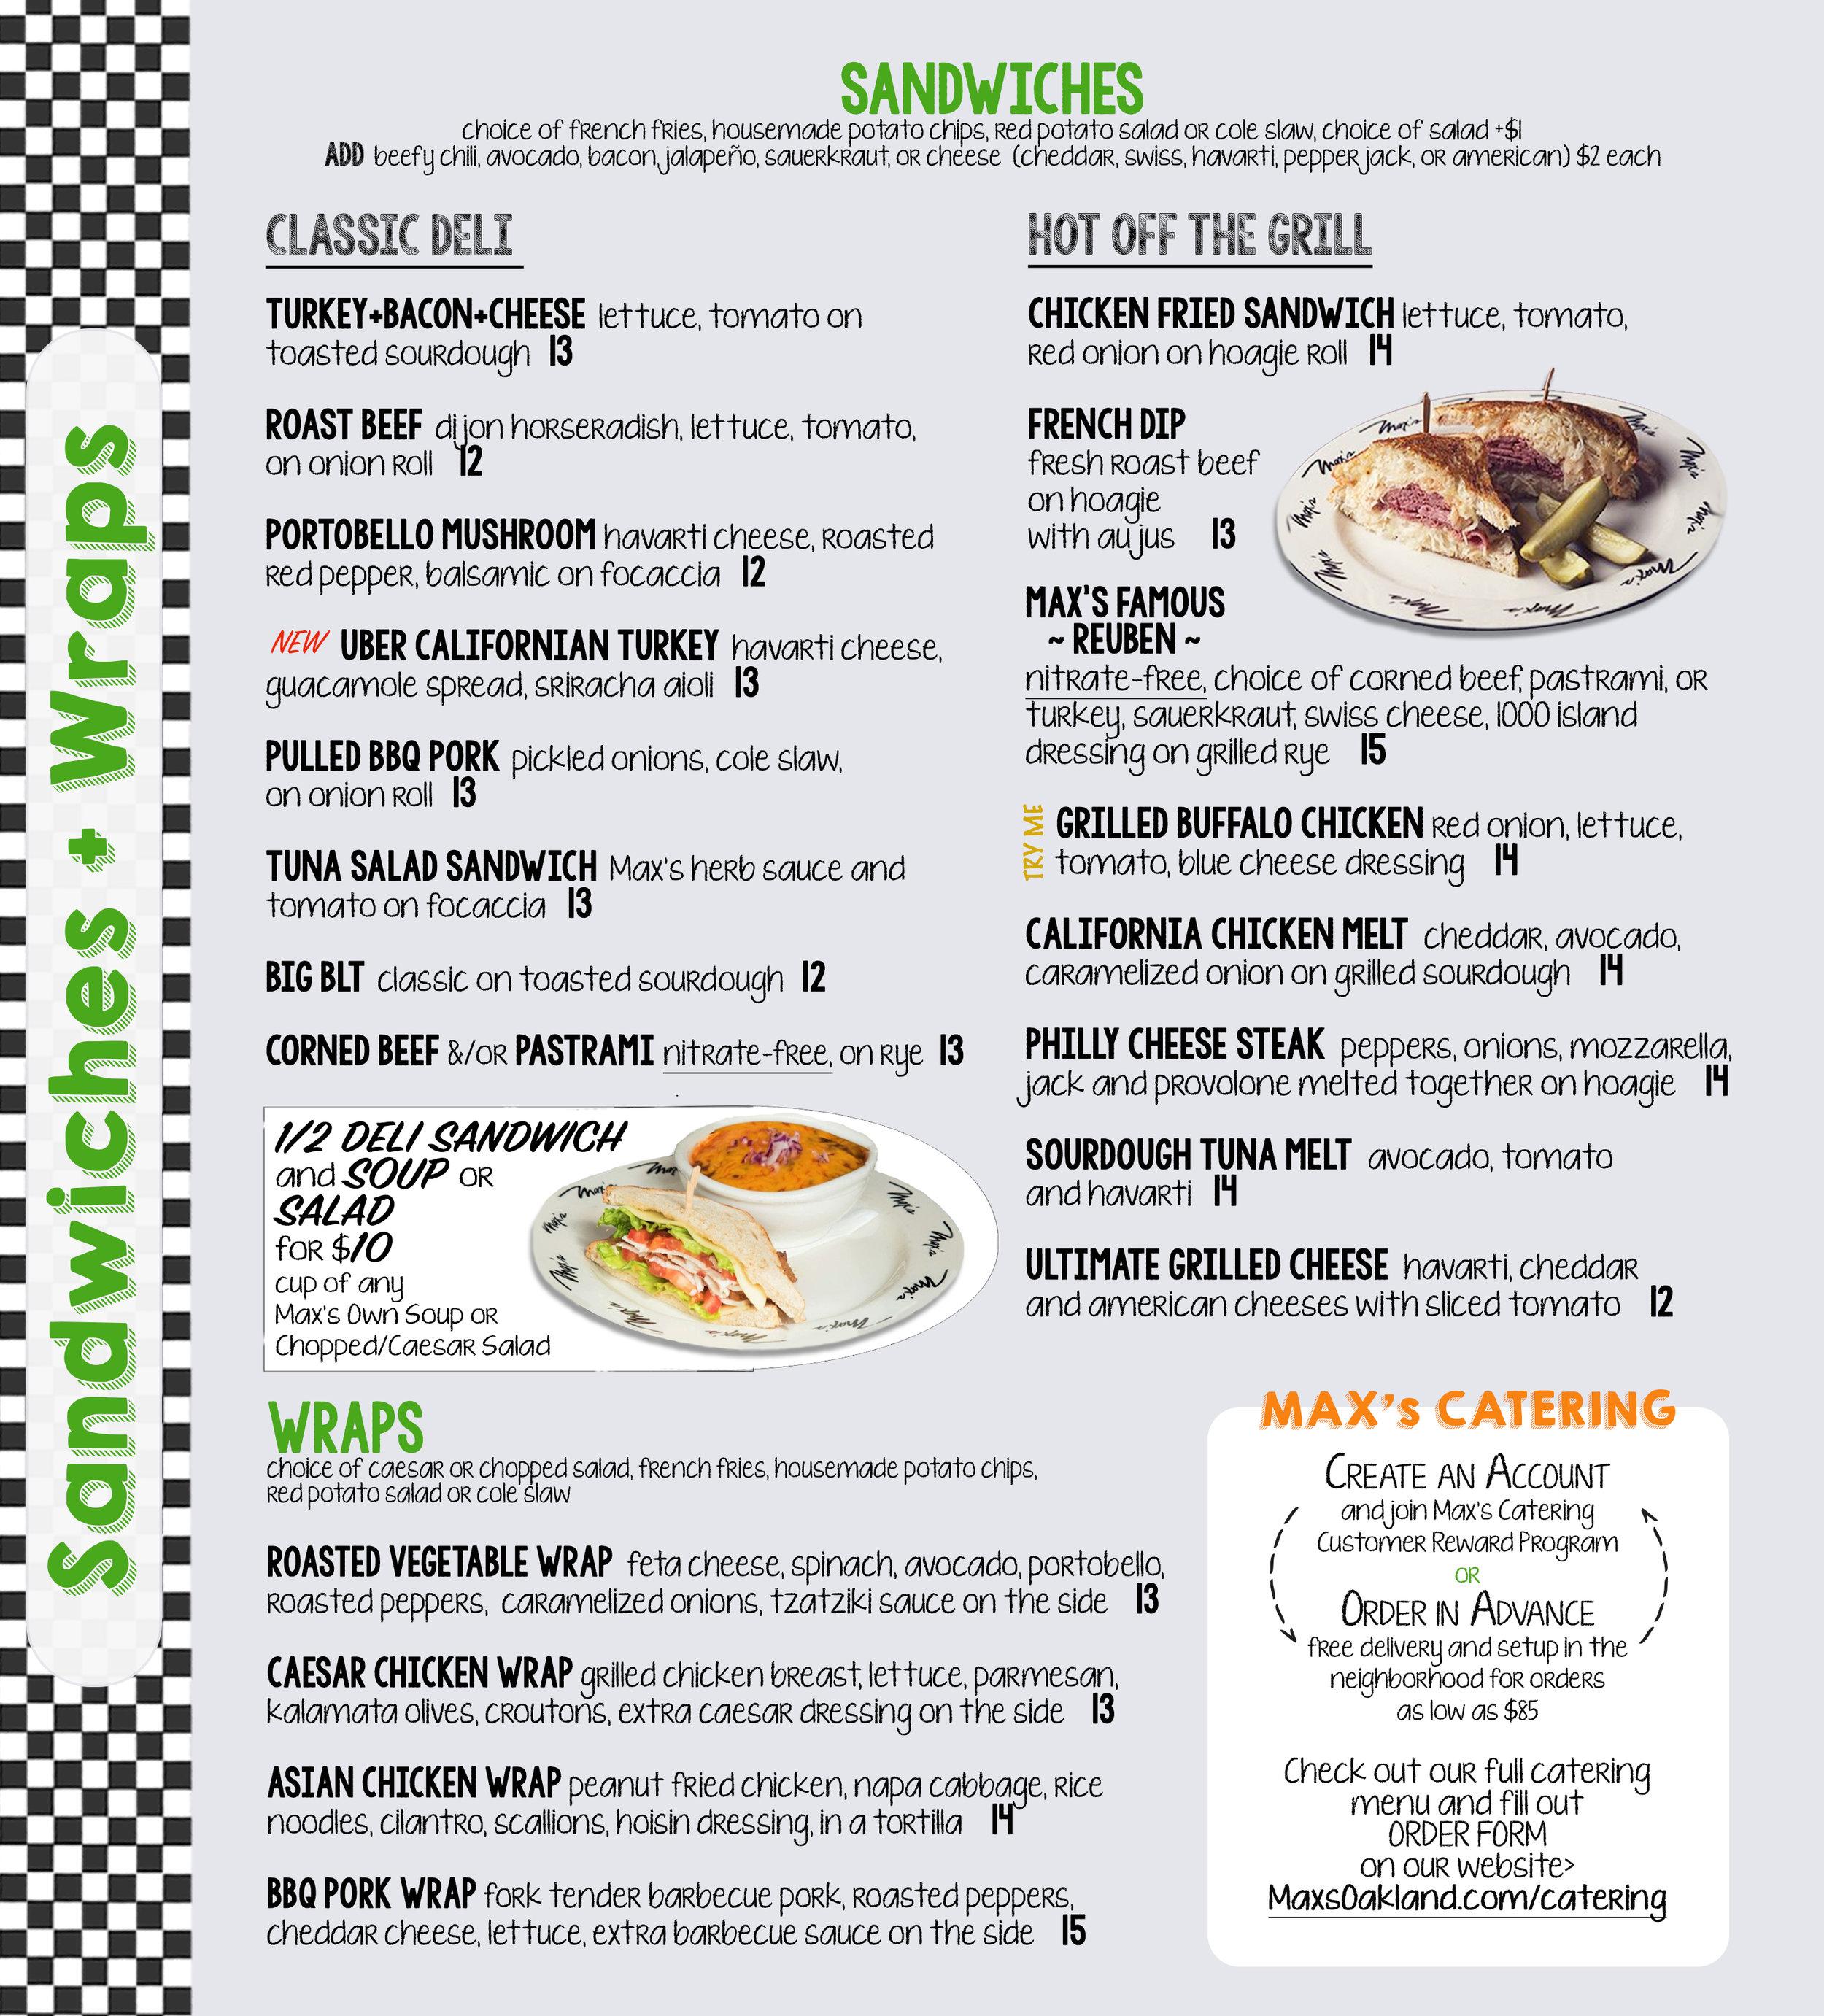 Max's menu page 2.2.jpg